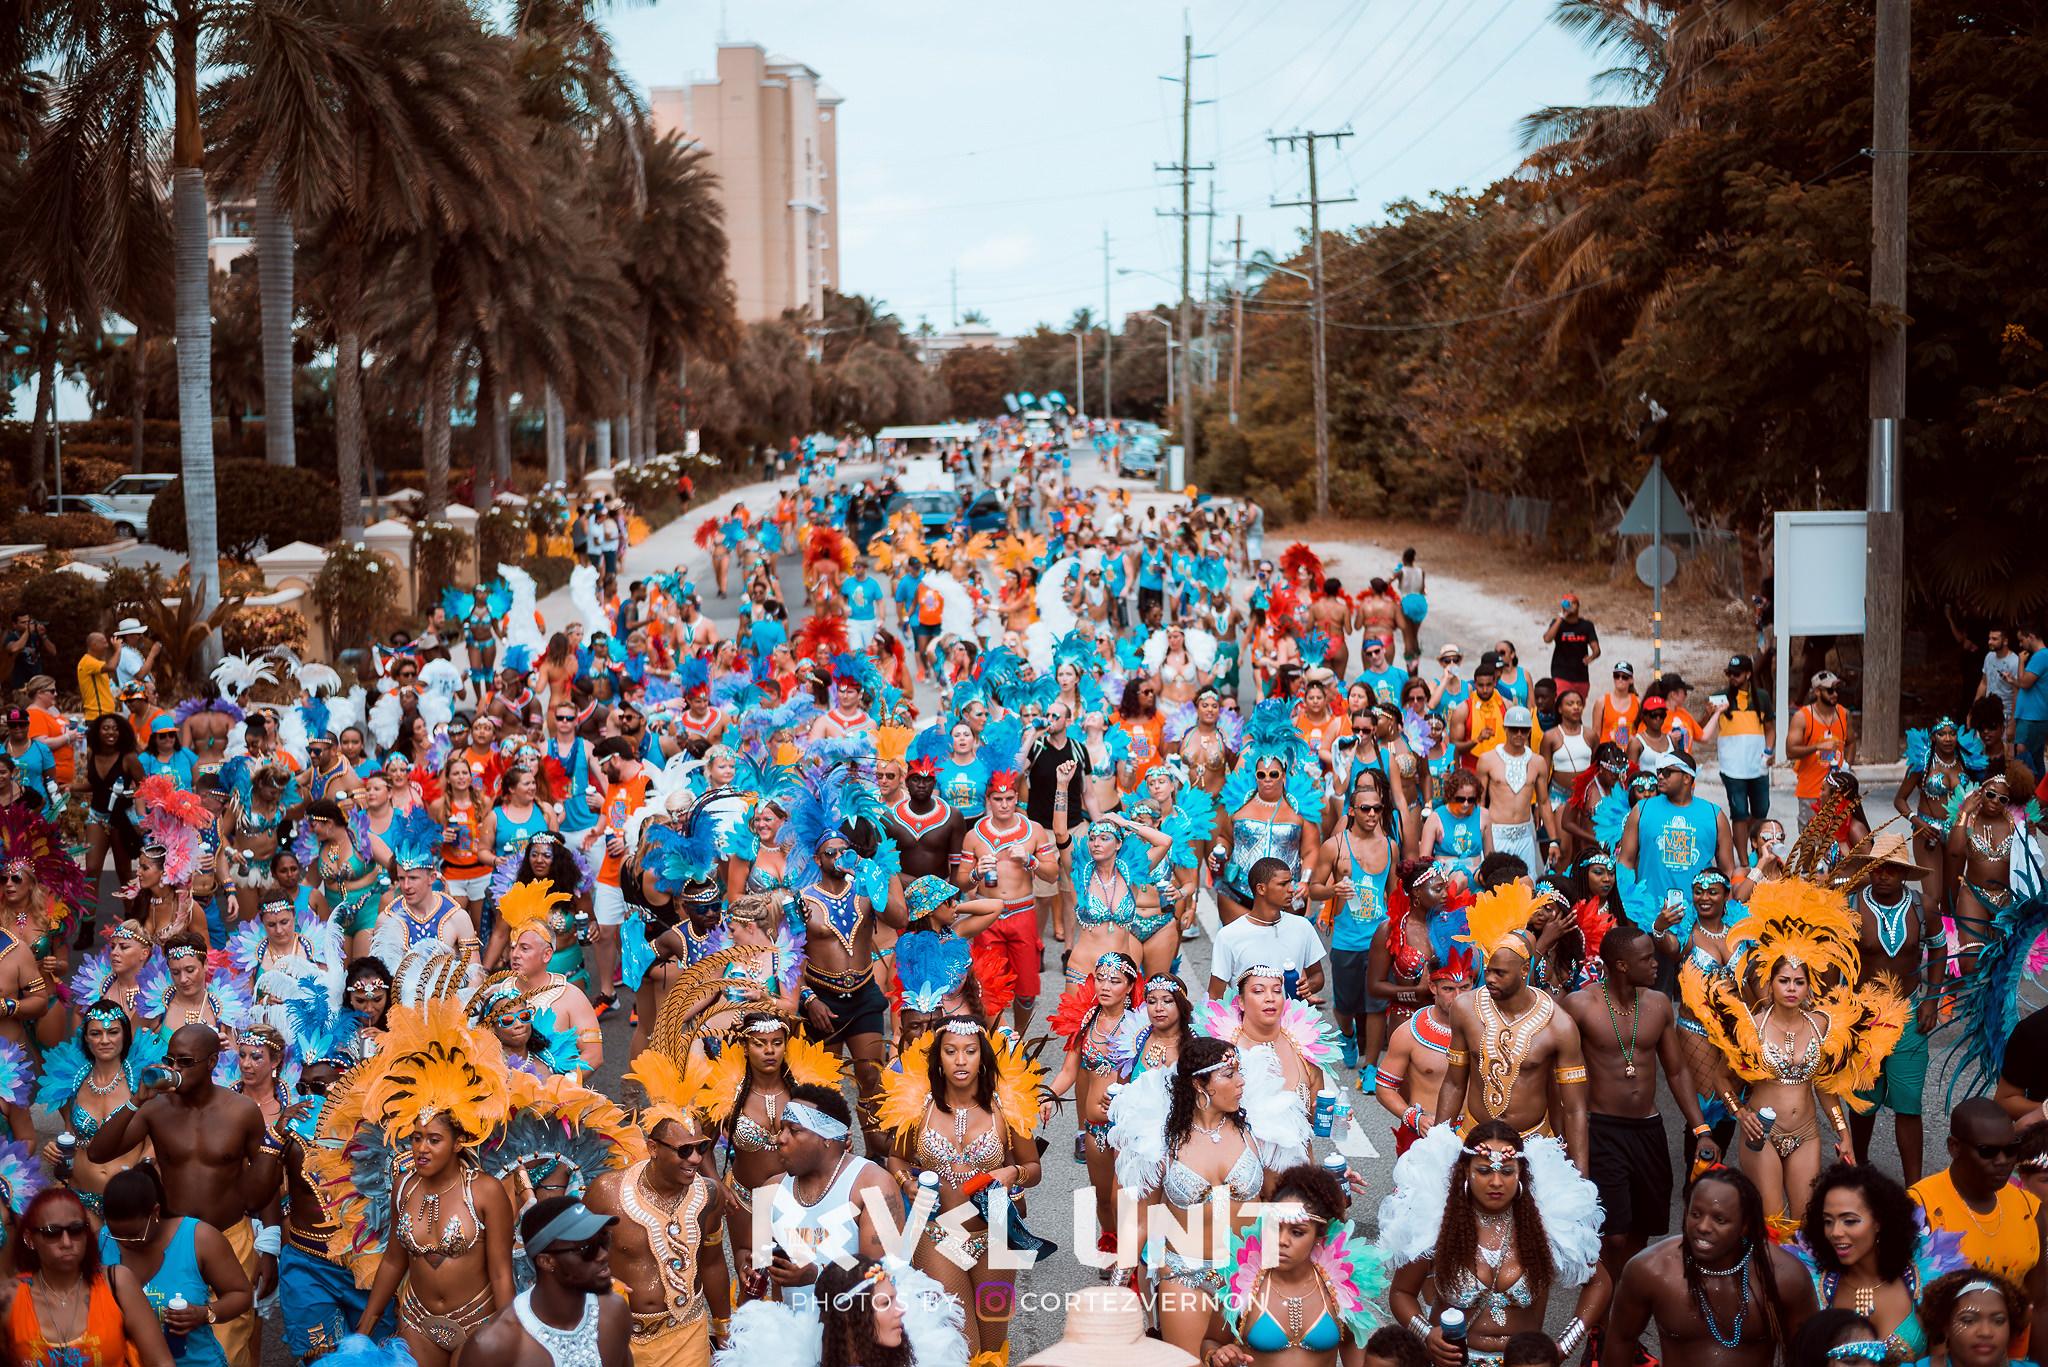 Revel Unit - Batabano 2017 (24).jpg